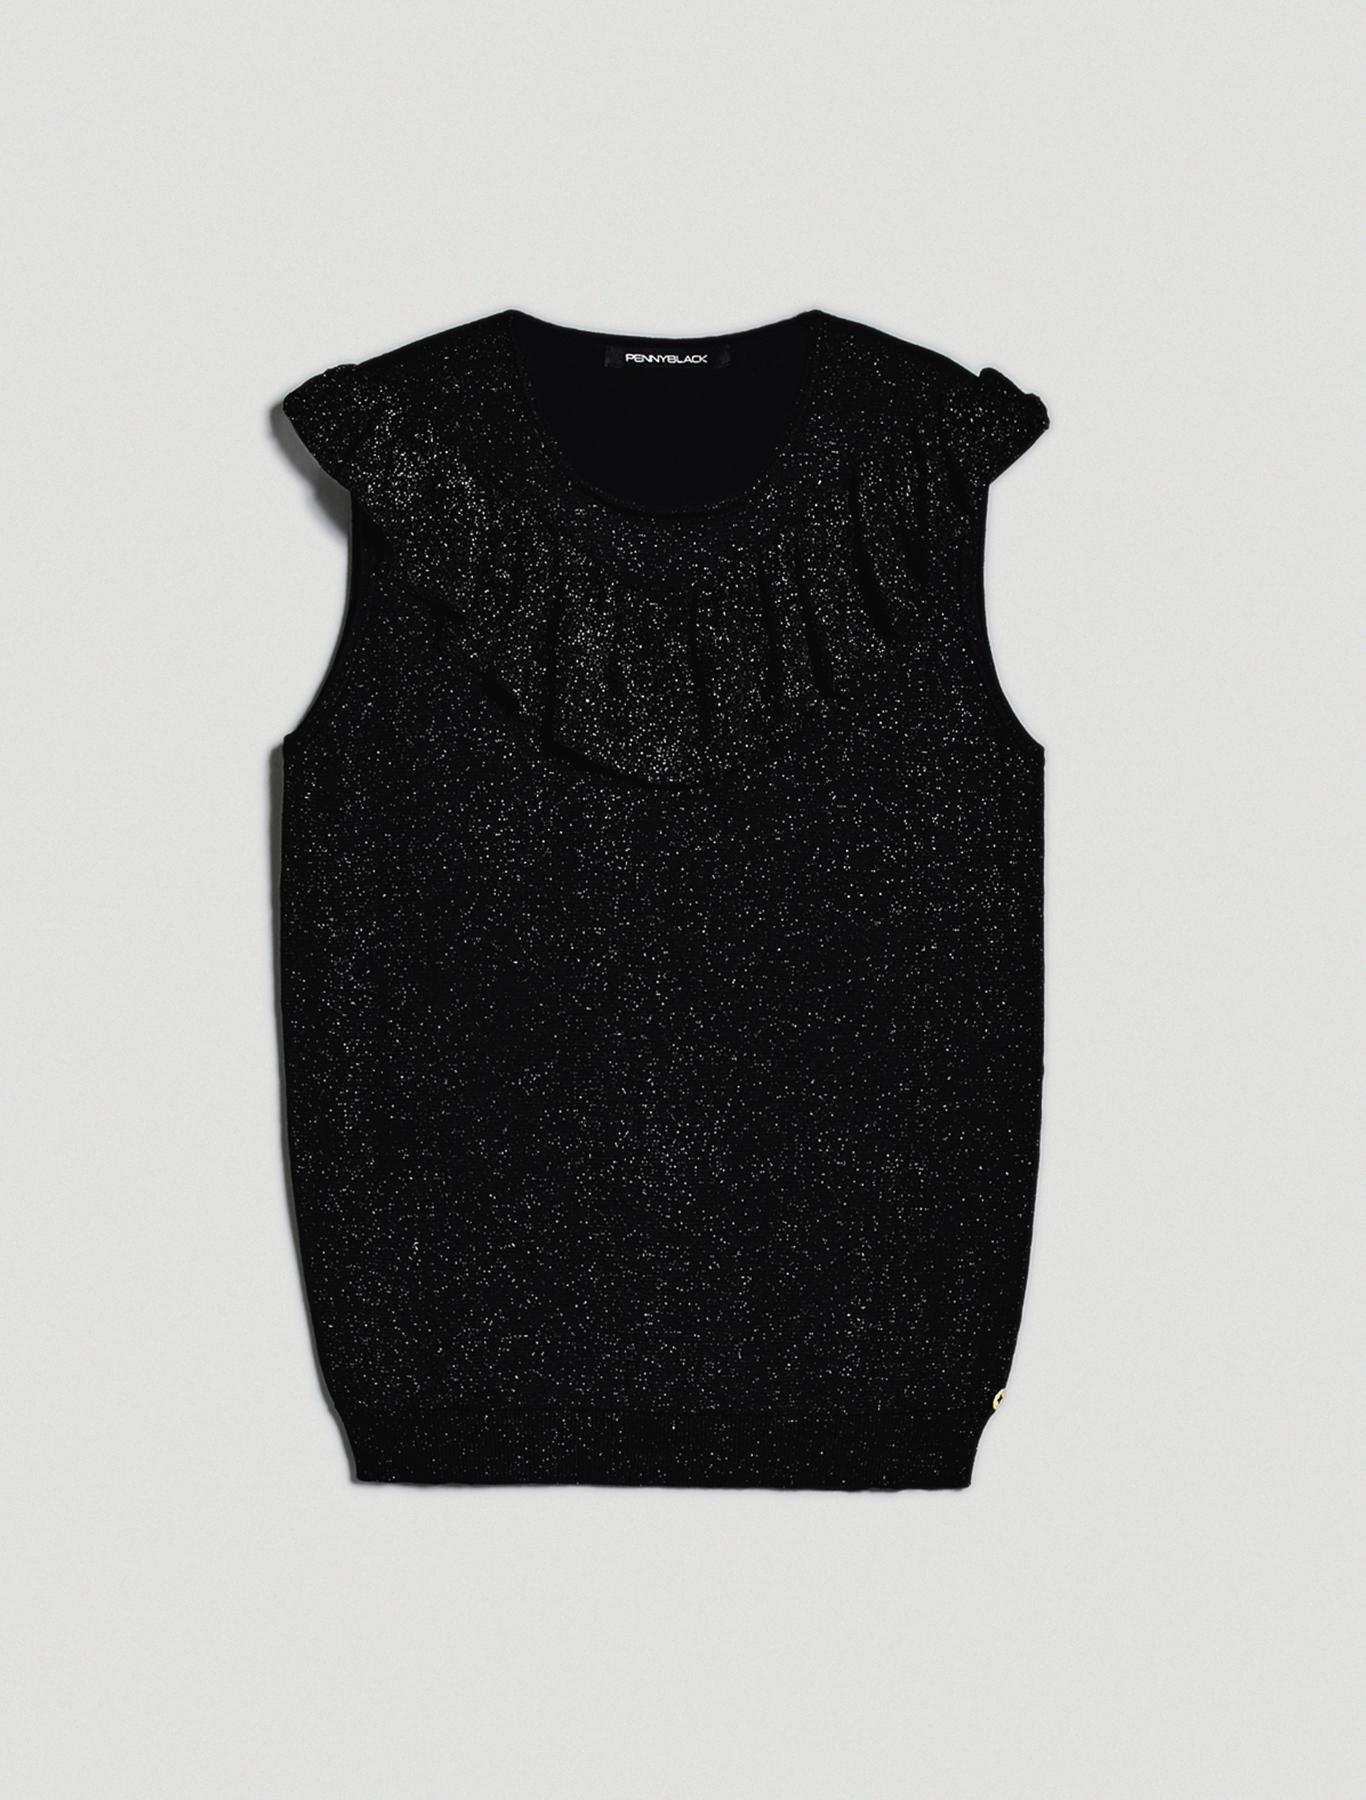 Ruched lamé knit top - black - pennyblack